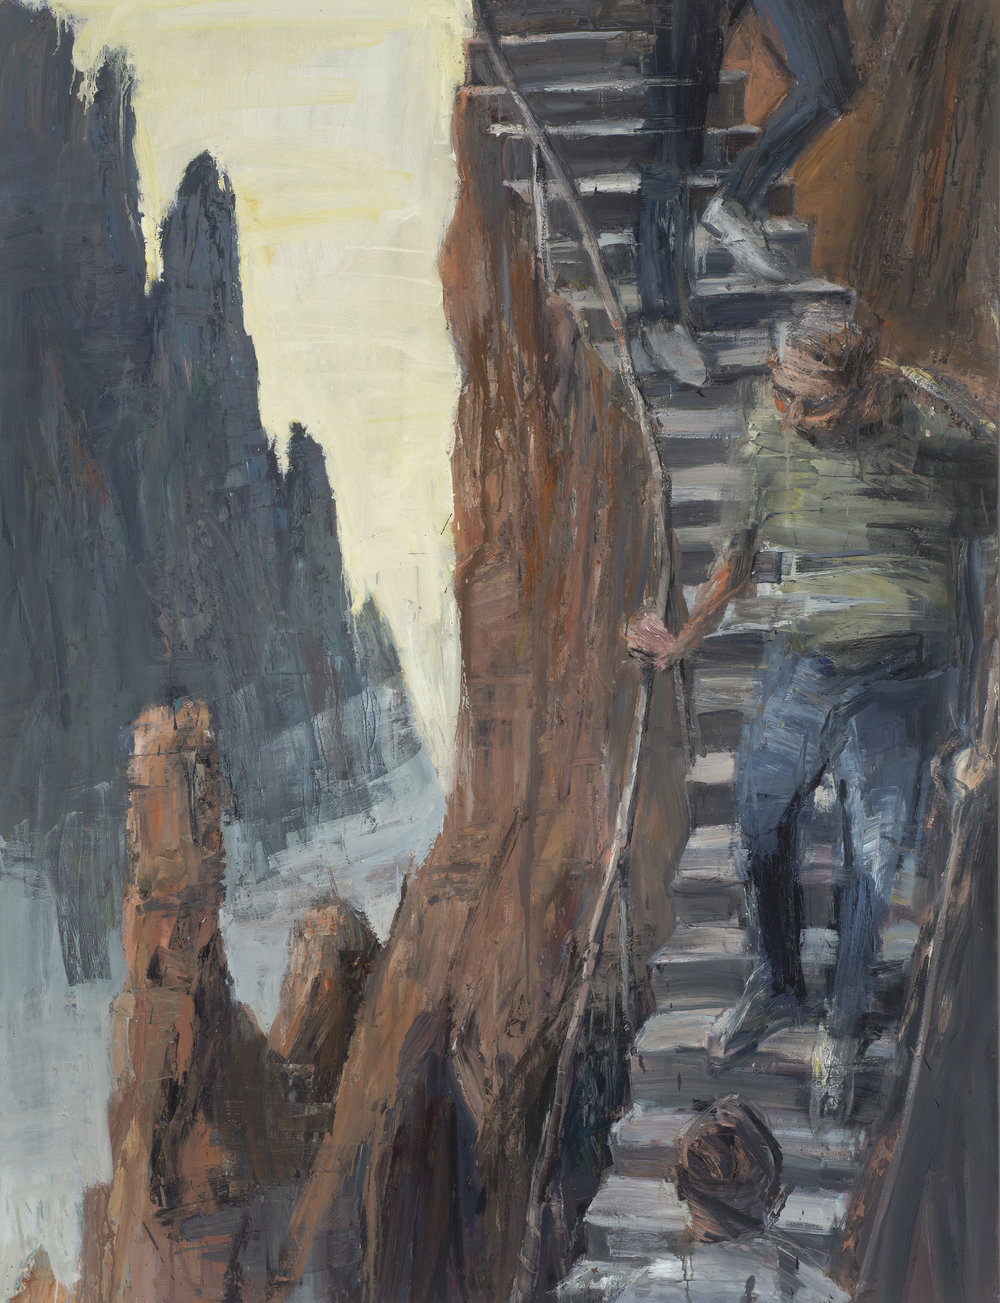 Self portrait? Going Down  自畫像? 沿路往下   Euan Macleod , 2016  Oil on polyester, 180 x 137 cm, HKD 189,800